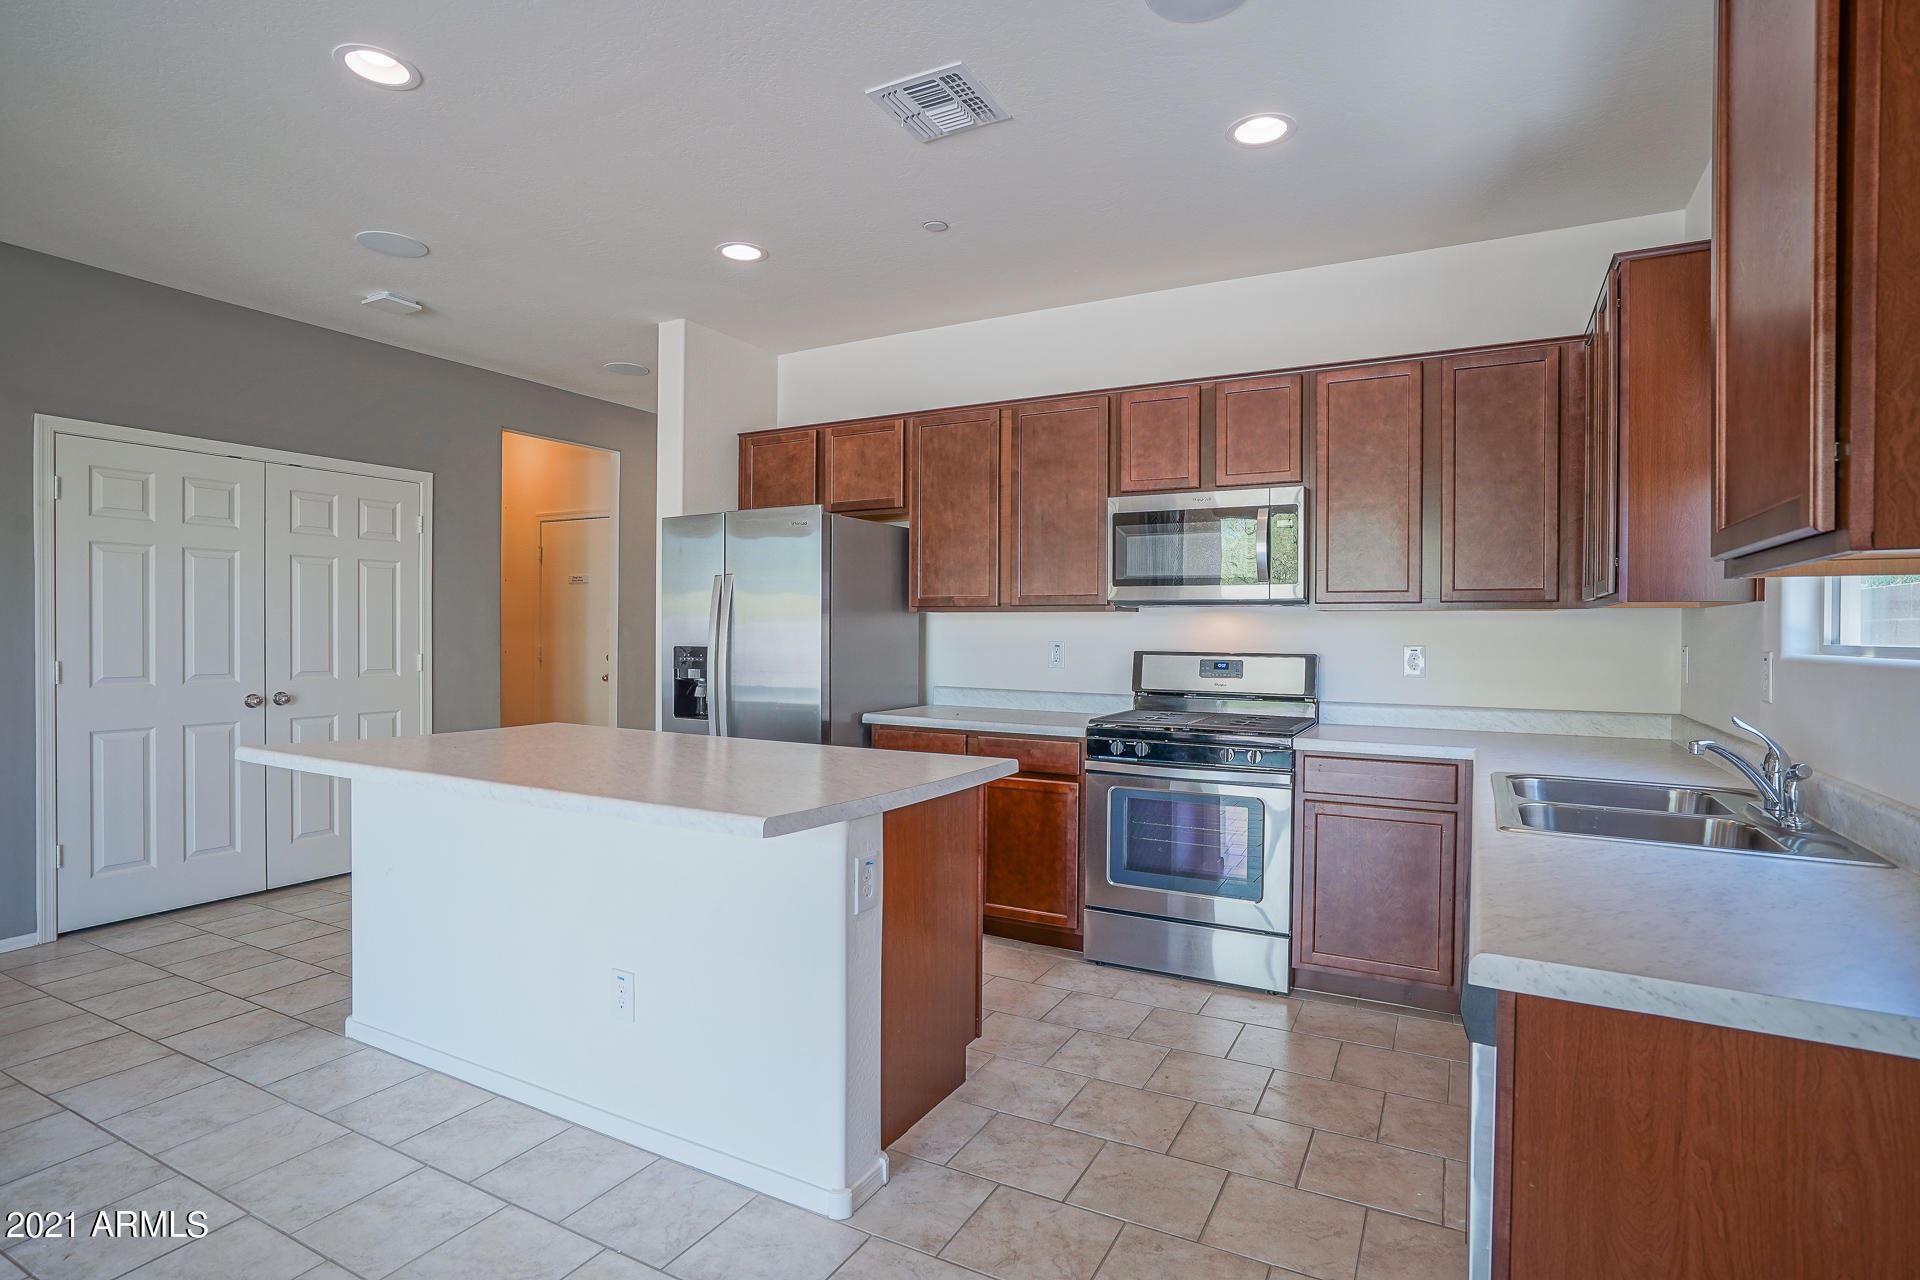 Photo of 2248 N 212TH Lane, Buckeye, AZ 85396 (MLS # 6249328)